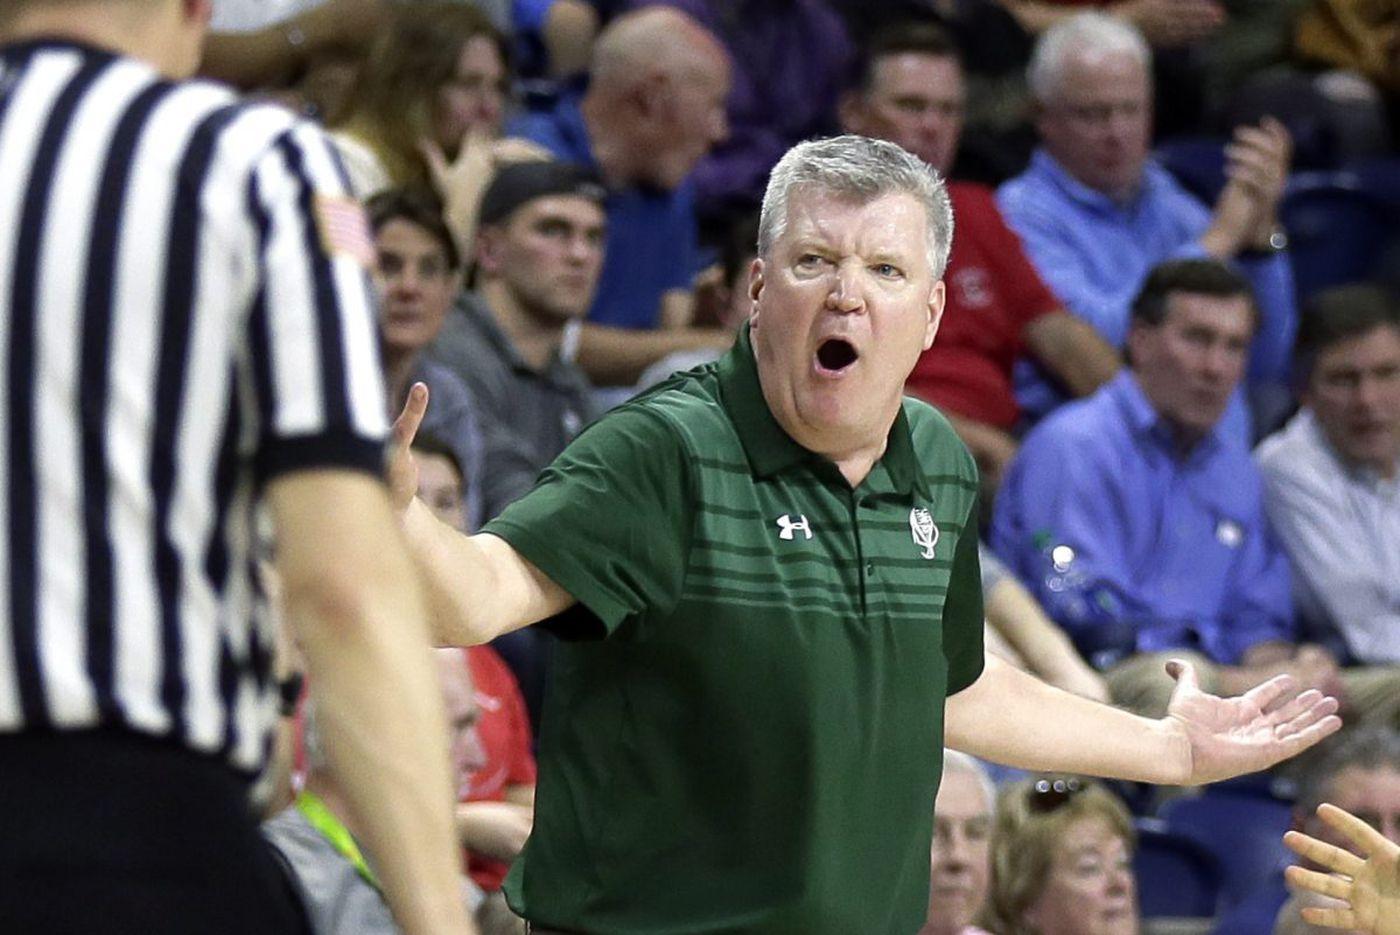 Jack Concannon steps away as Bonner-Prendergast basketball coach